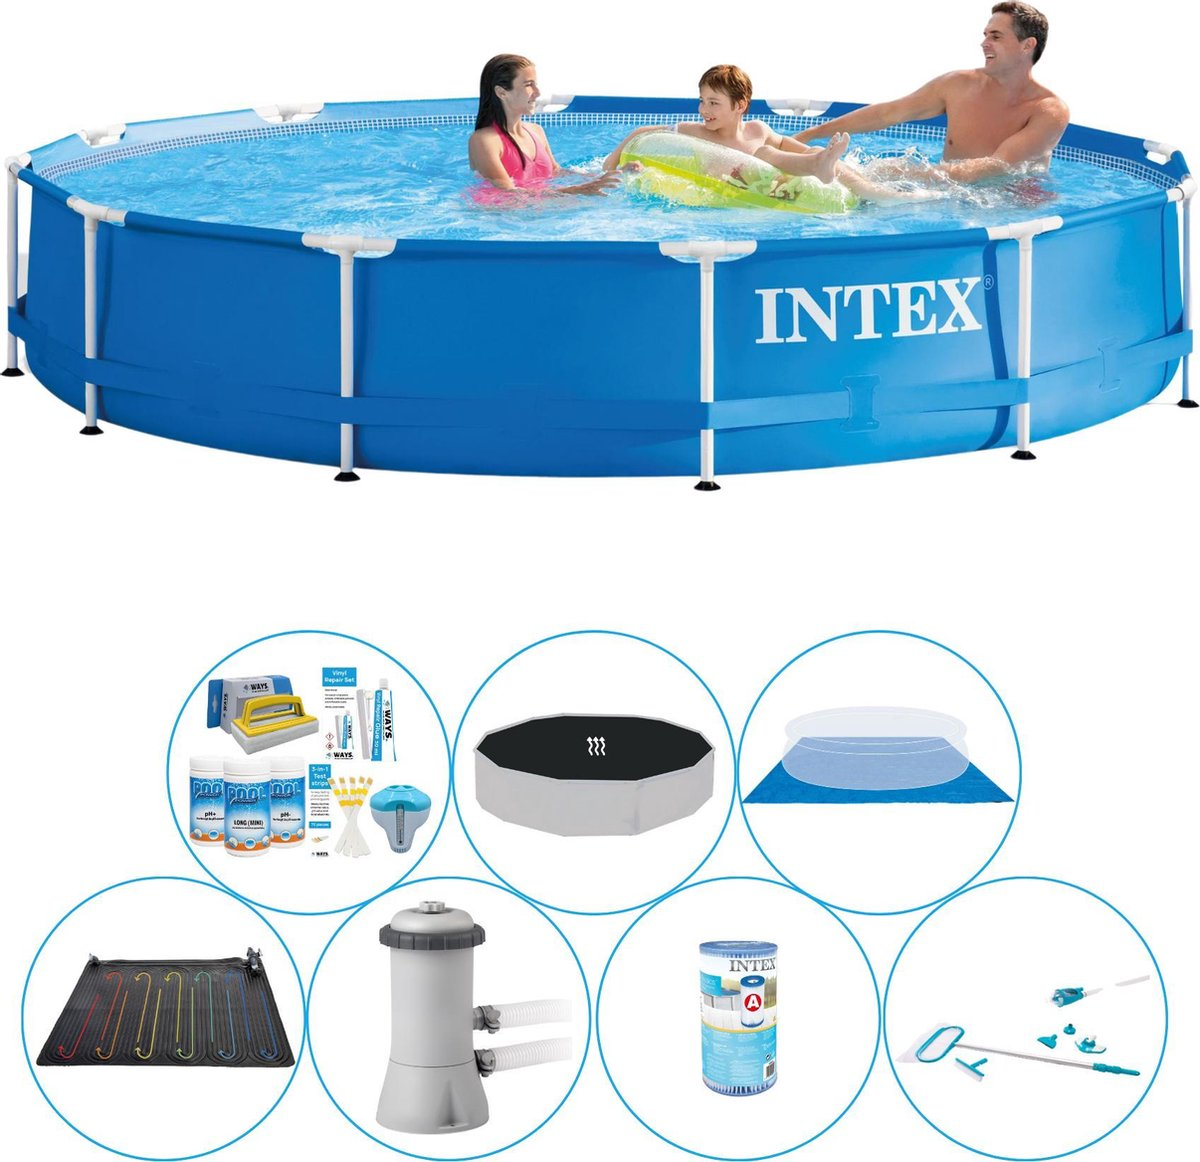 Intex Metal Frame Rond 366x76 cm - Alles in 1 Zwembad Set